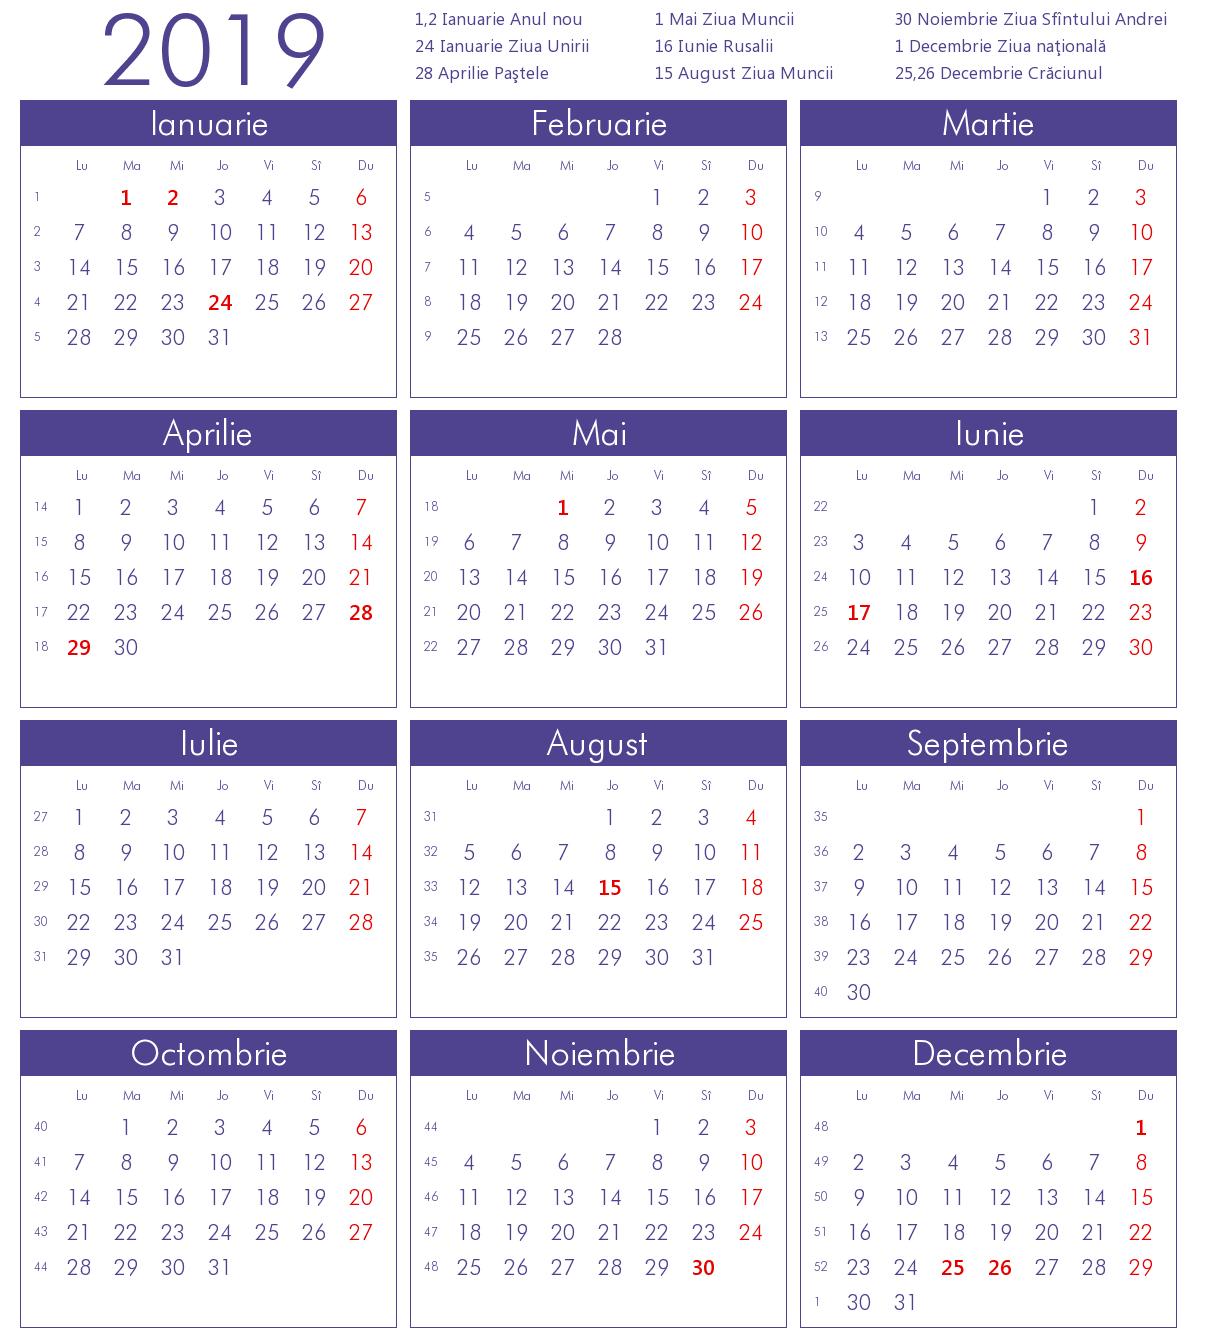 Calendar 2019 Limba Romana Sarbatori Legale At Calendarul Lunar – Bgadv Calendar 2019 Romana